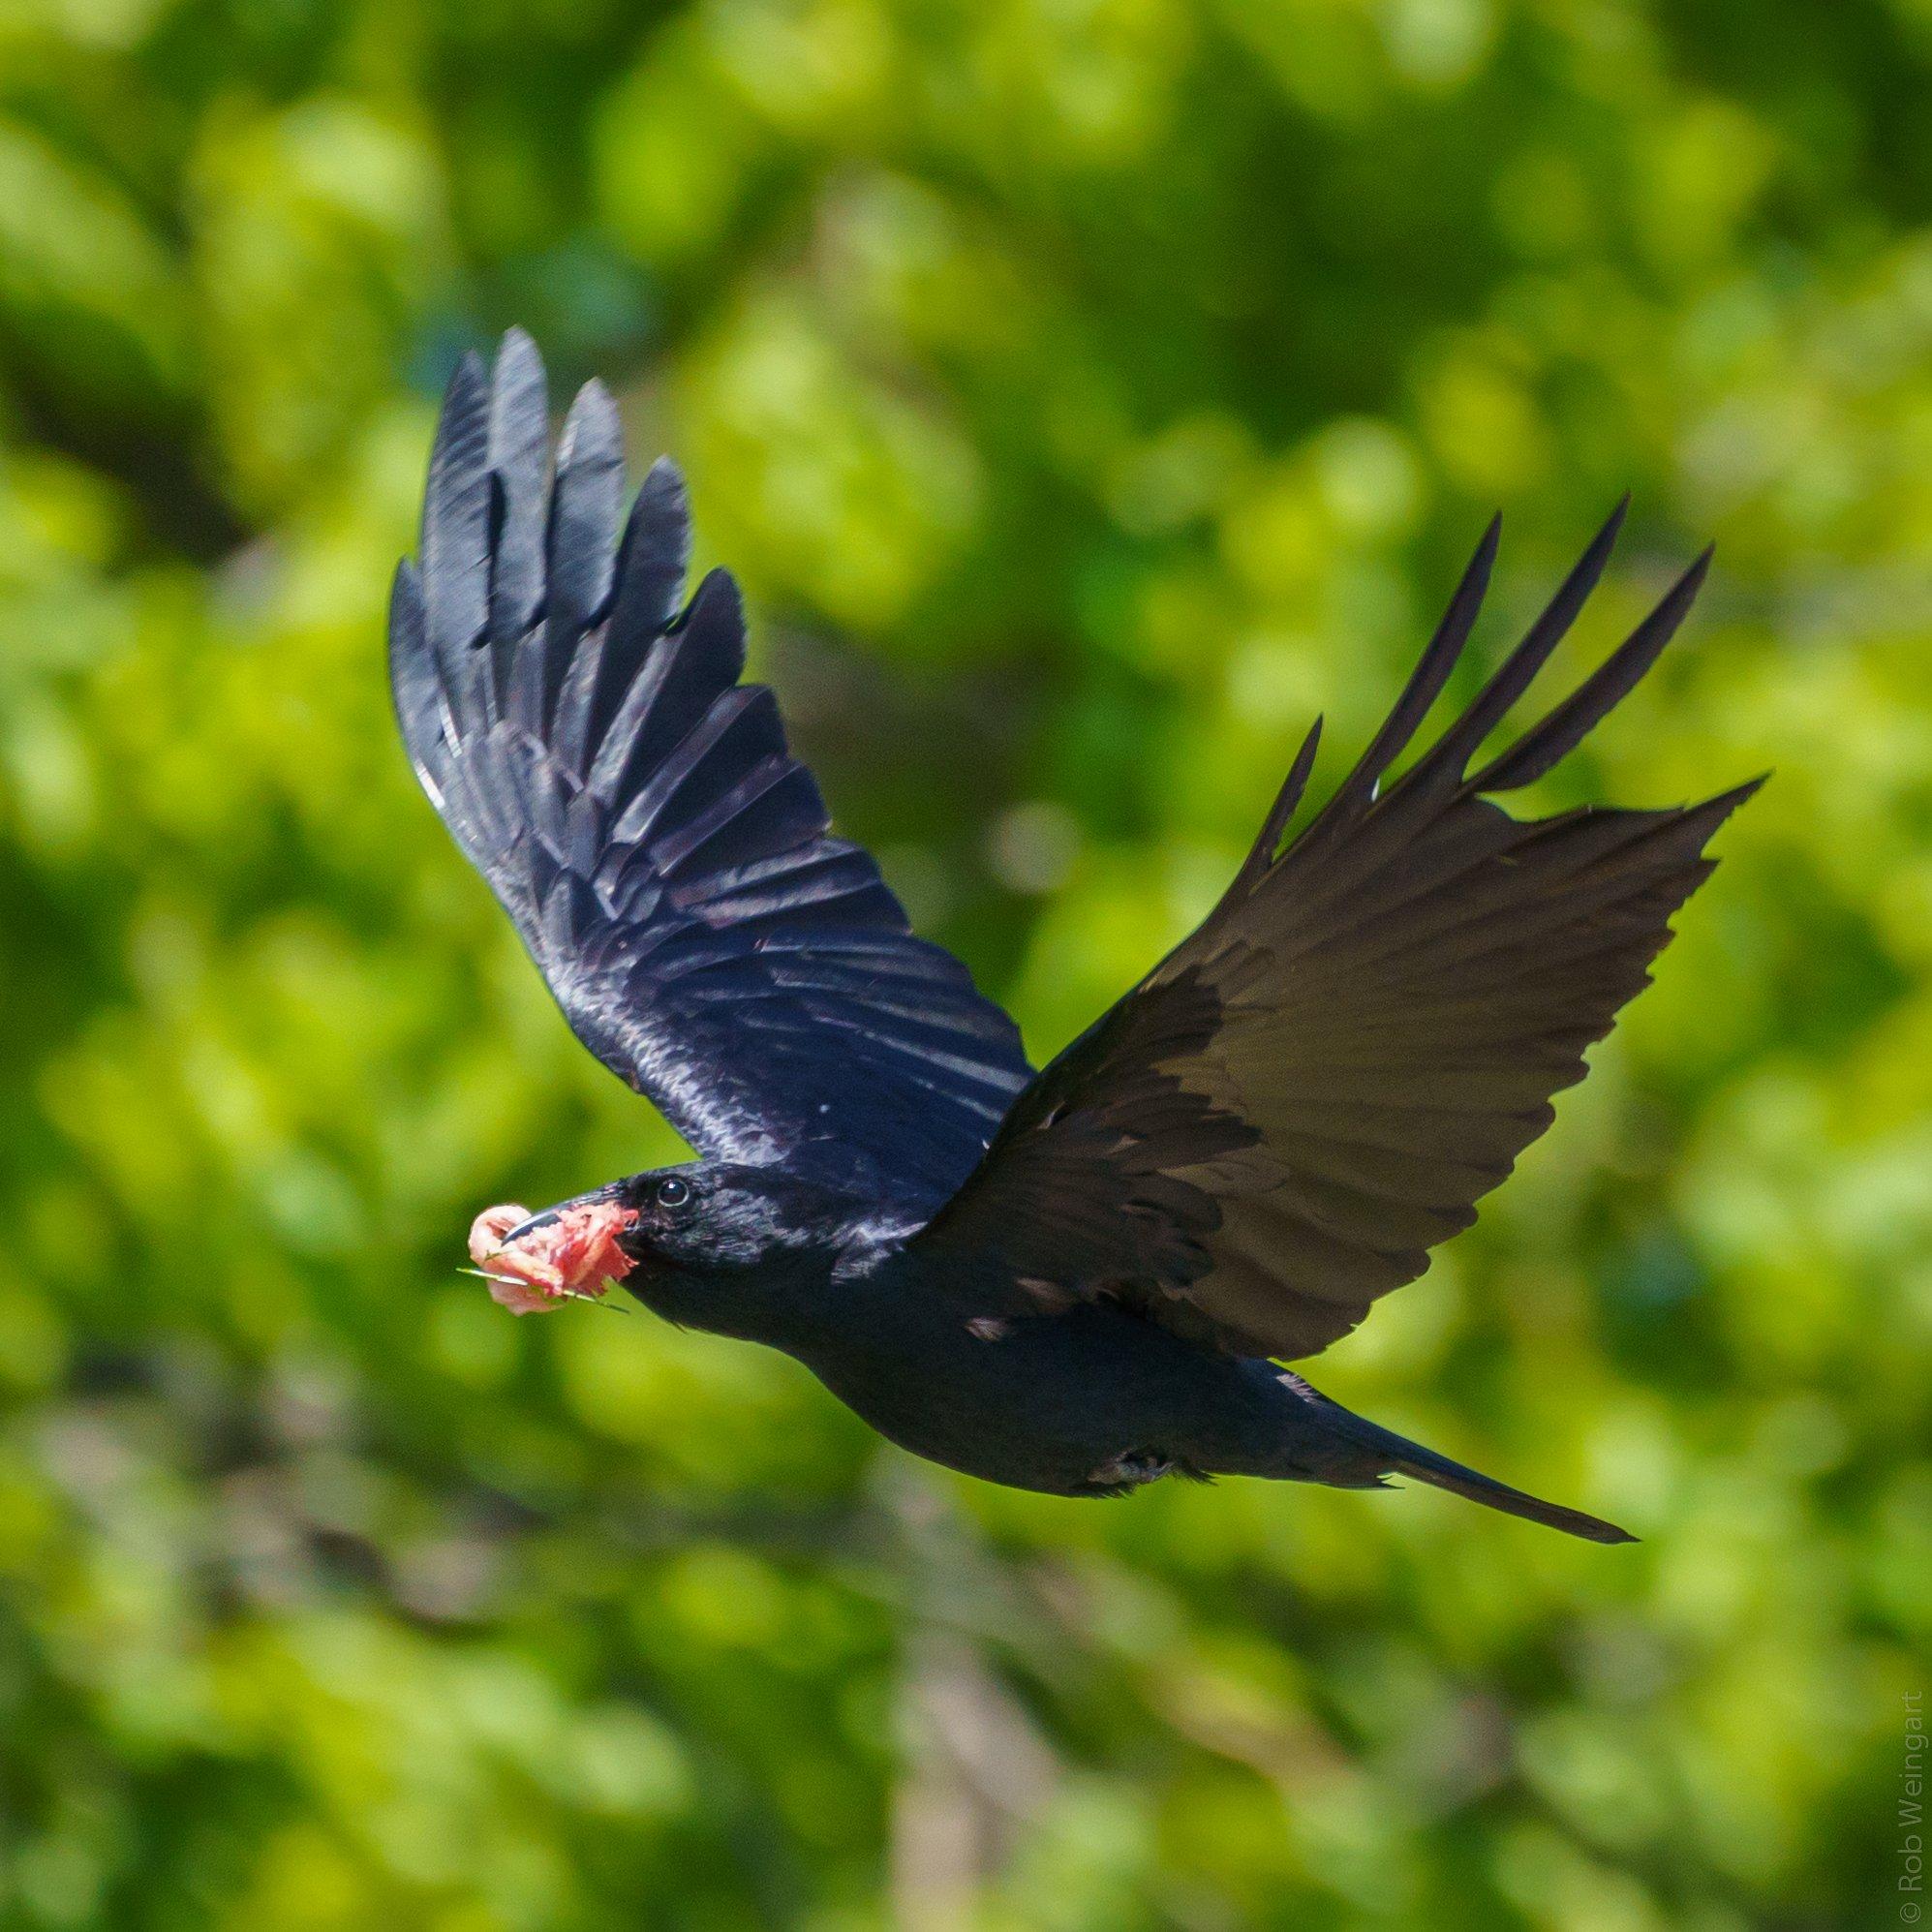 wildlife_photography_6.jpg